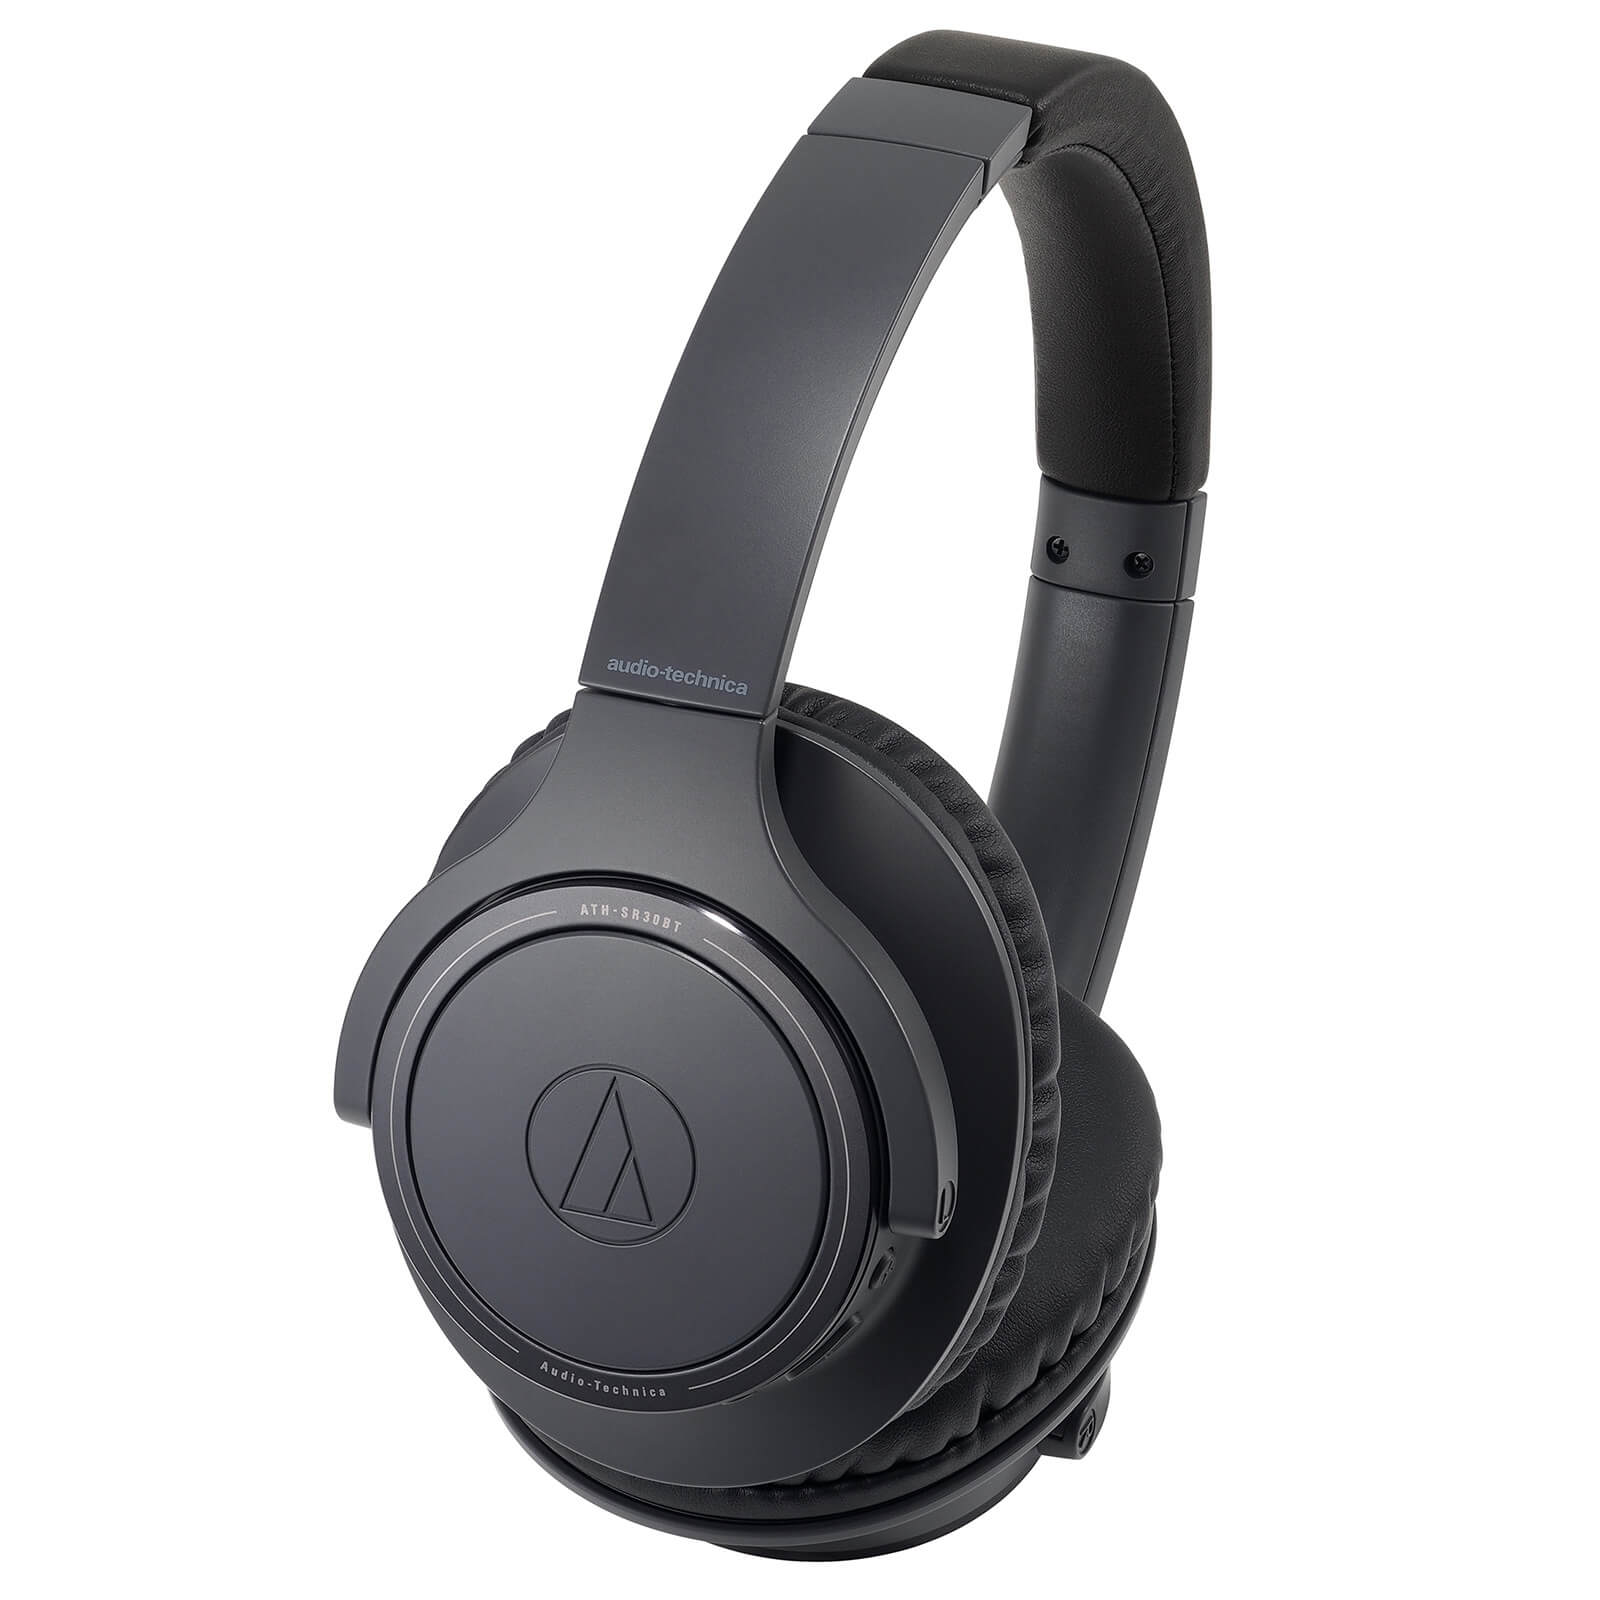 Audio Technica ATH-SR30BTBK Wireless Bluetooth Headphones - Black